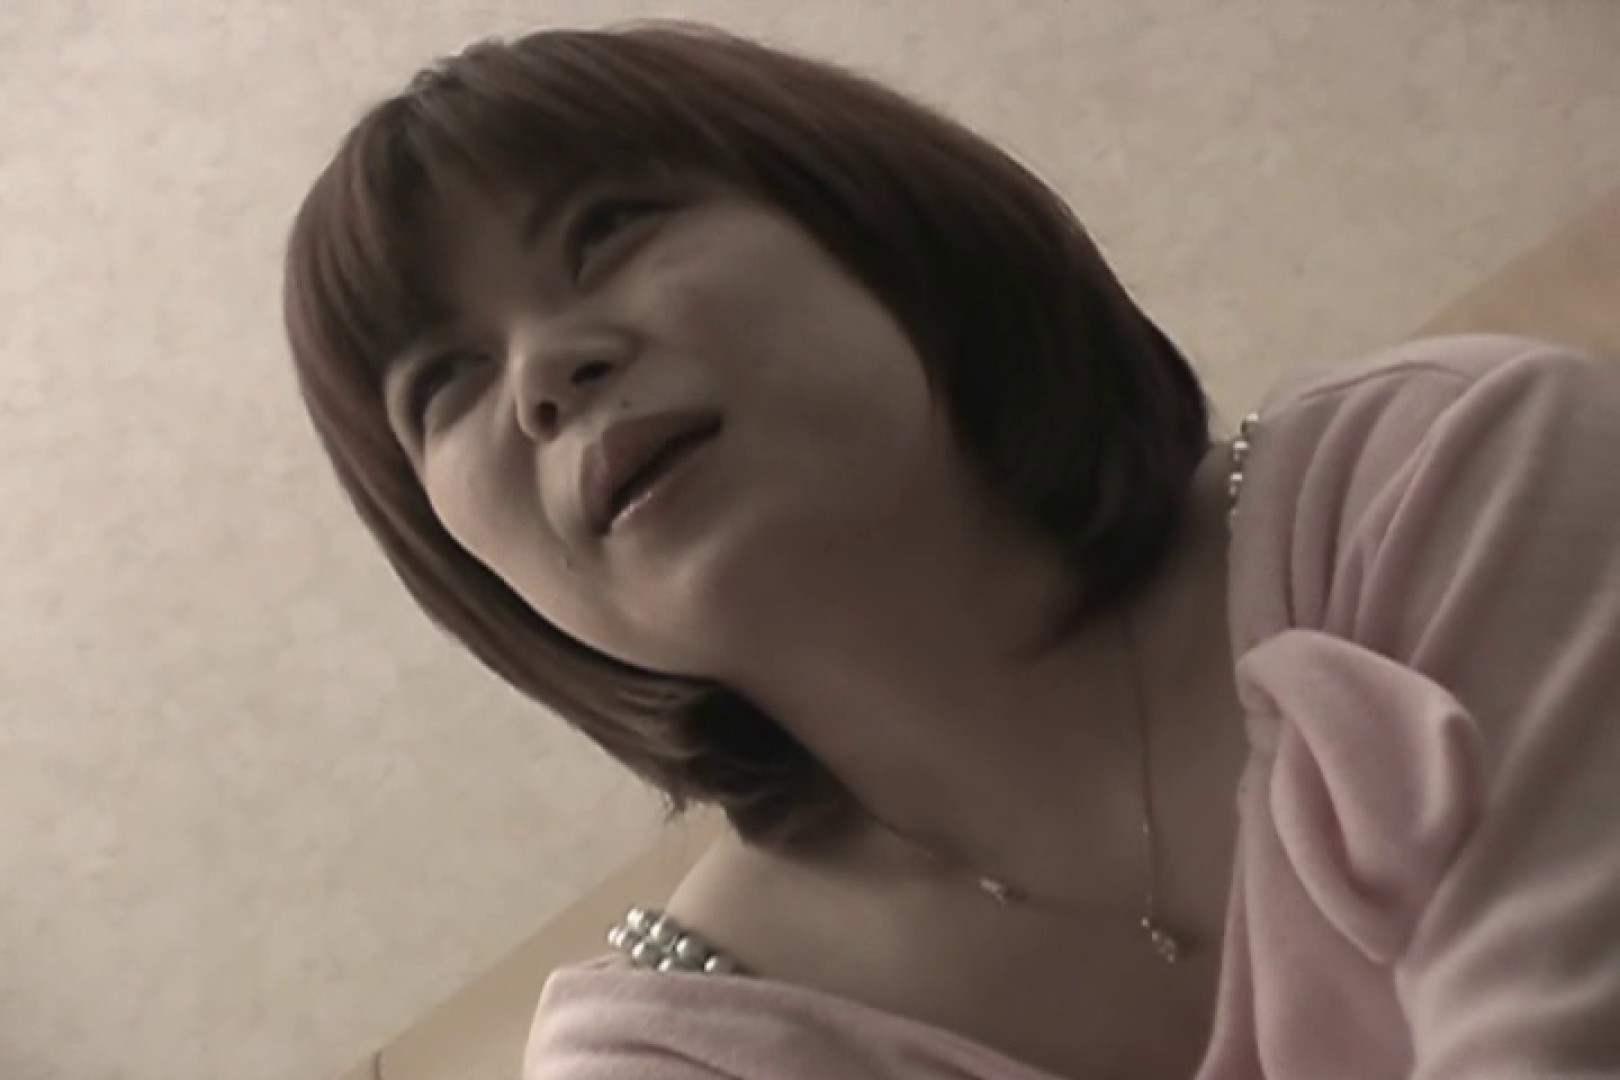 Hするために生まれてきたようなイキまくりの極エロ人妻~小池ゆり~ オナニー集 AV無料動画キャプチャ 59pic 20